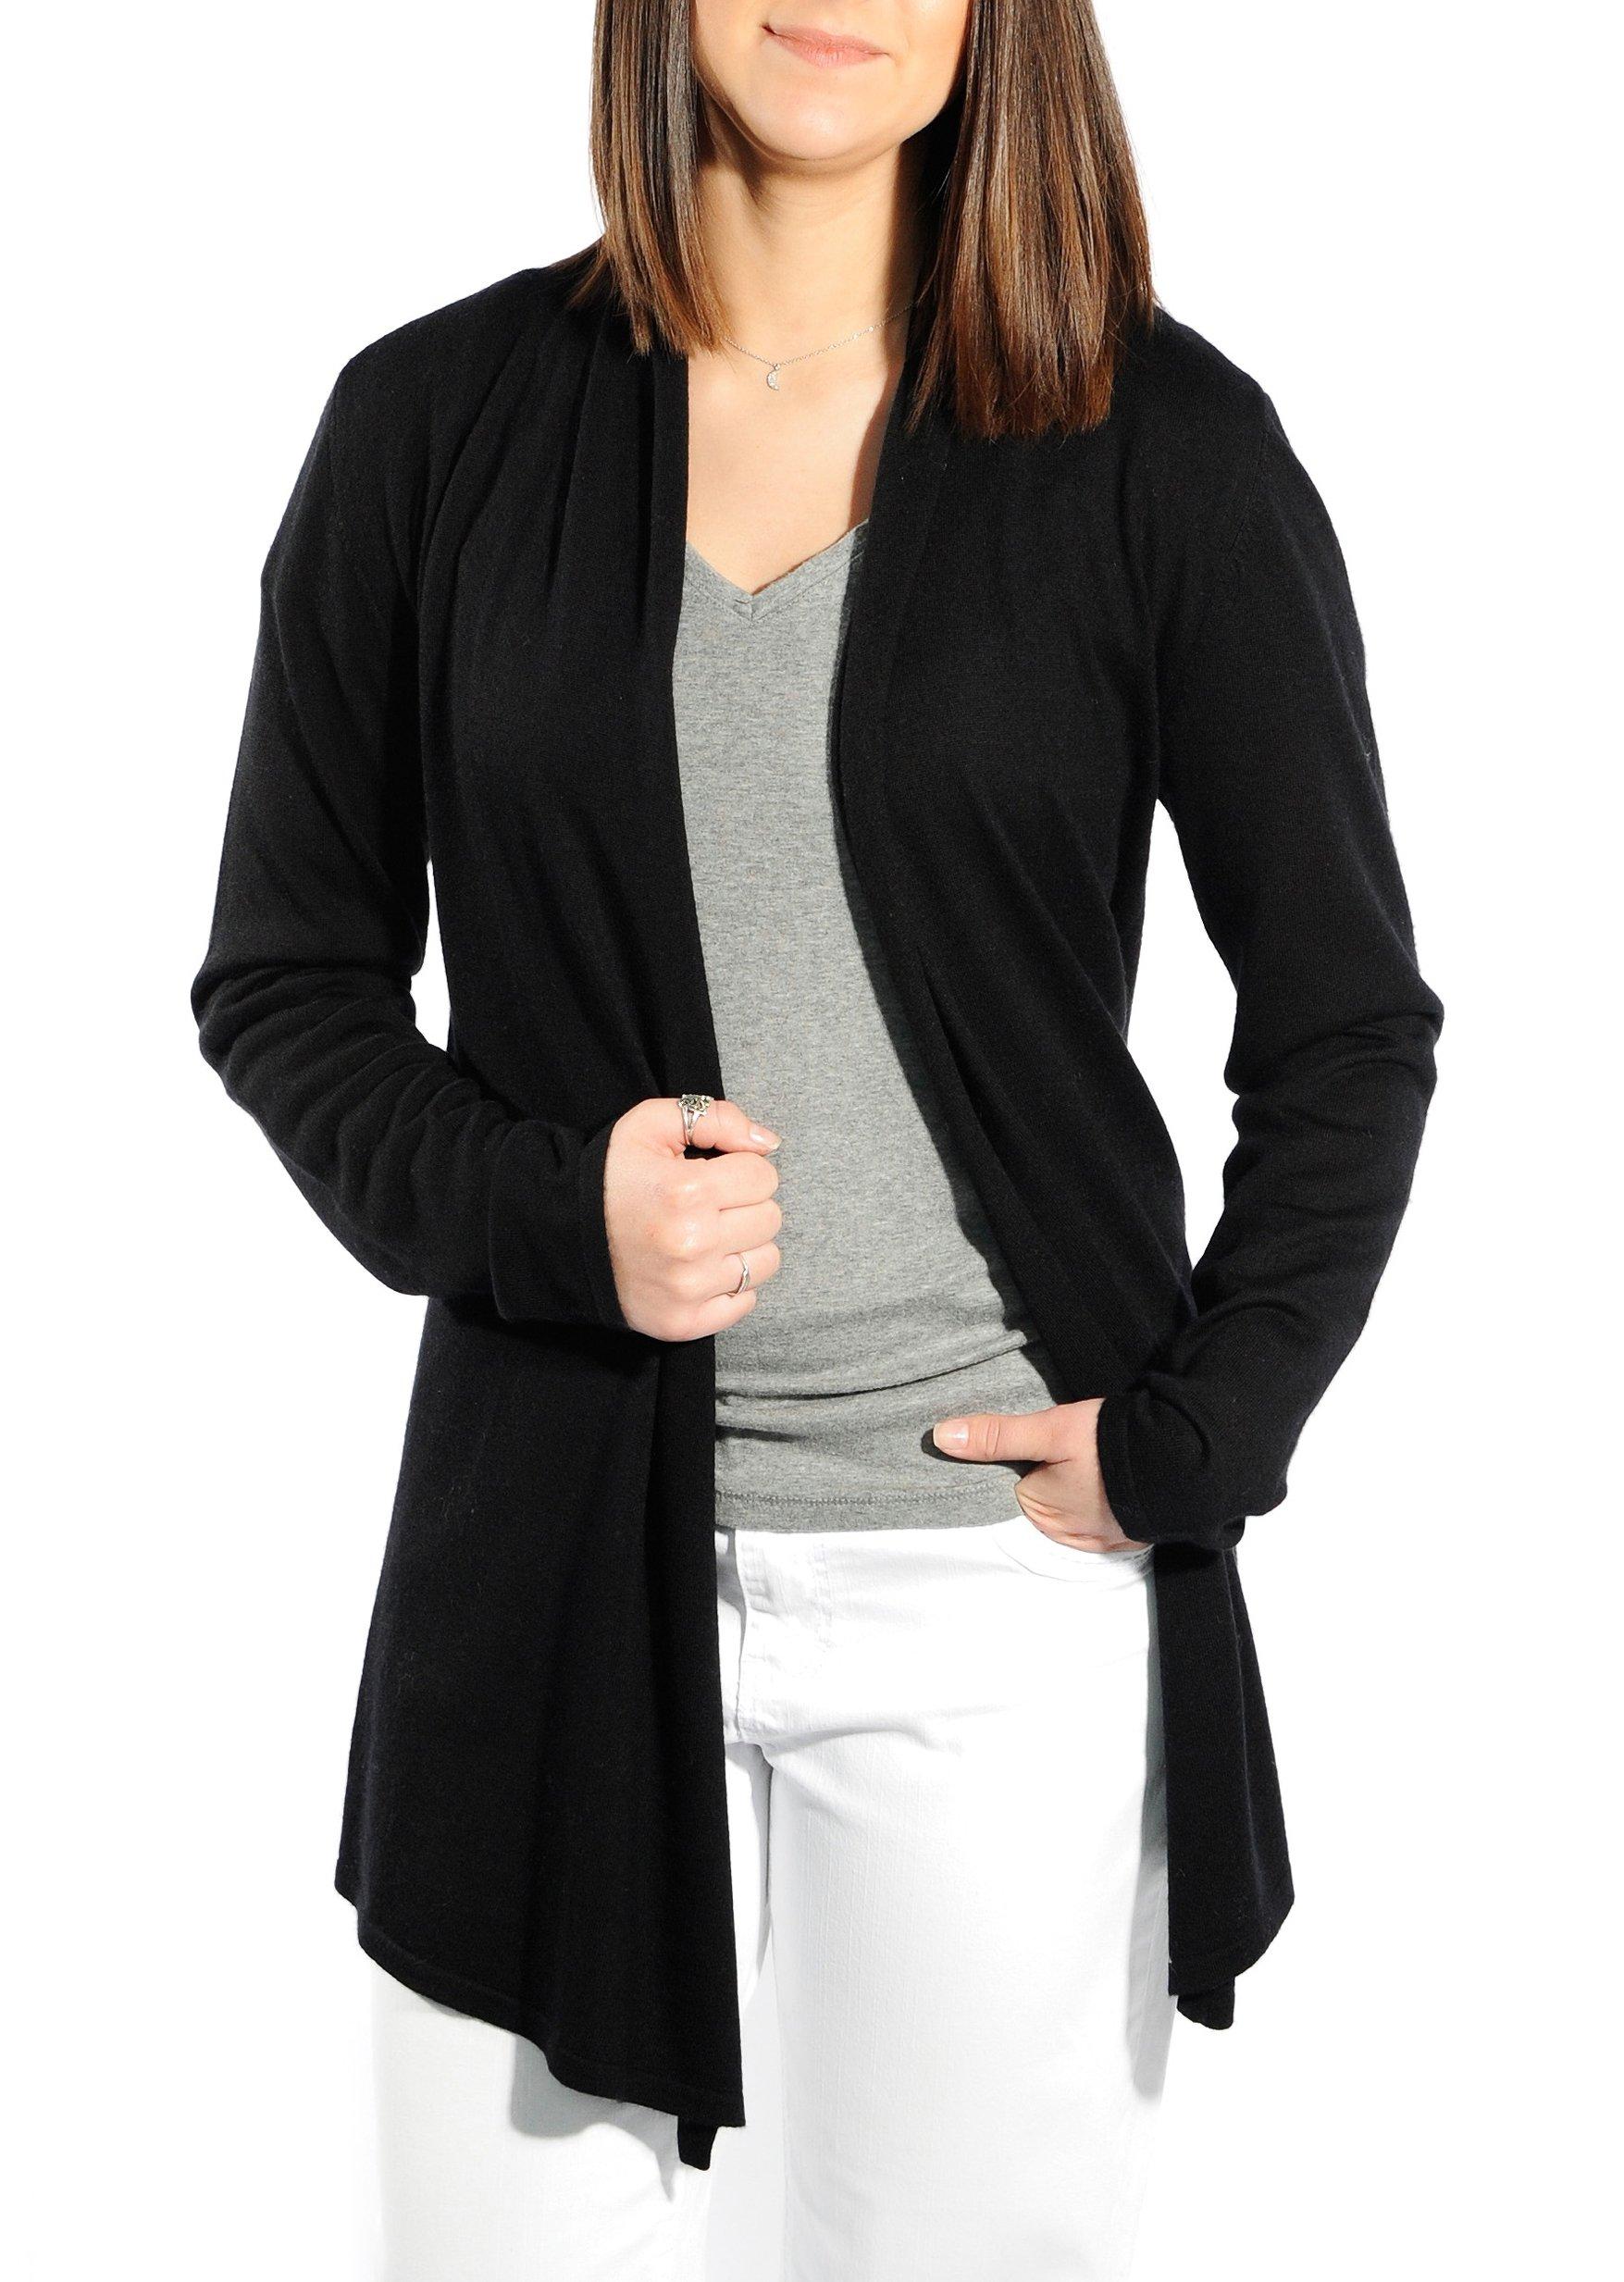 Gigi Reaume 100% Cashmere Women's Sweater, Open Front Long Cardigan, Swing Style, Ultra Lightweight (Medium, Black)